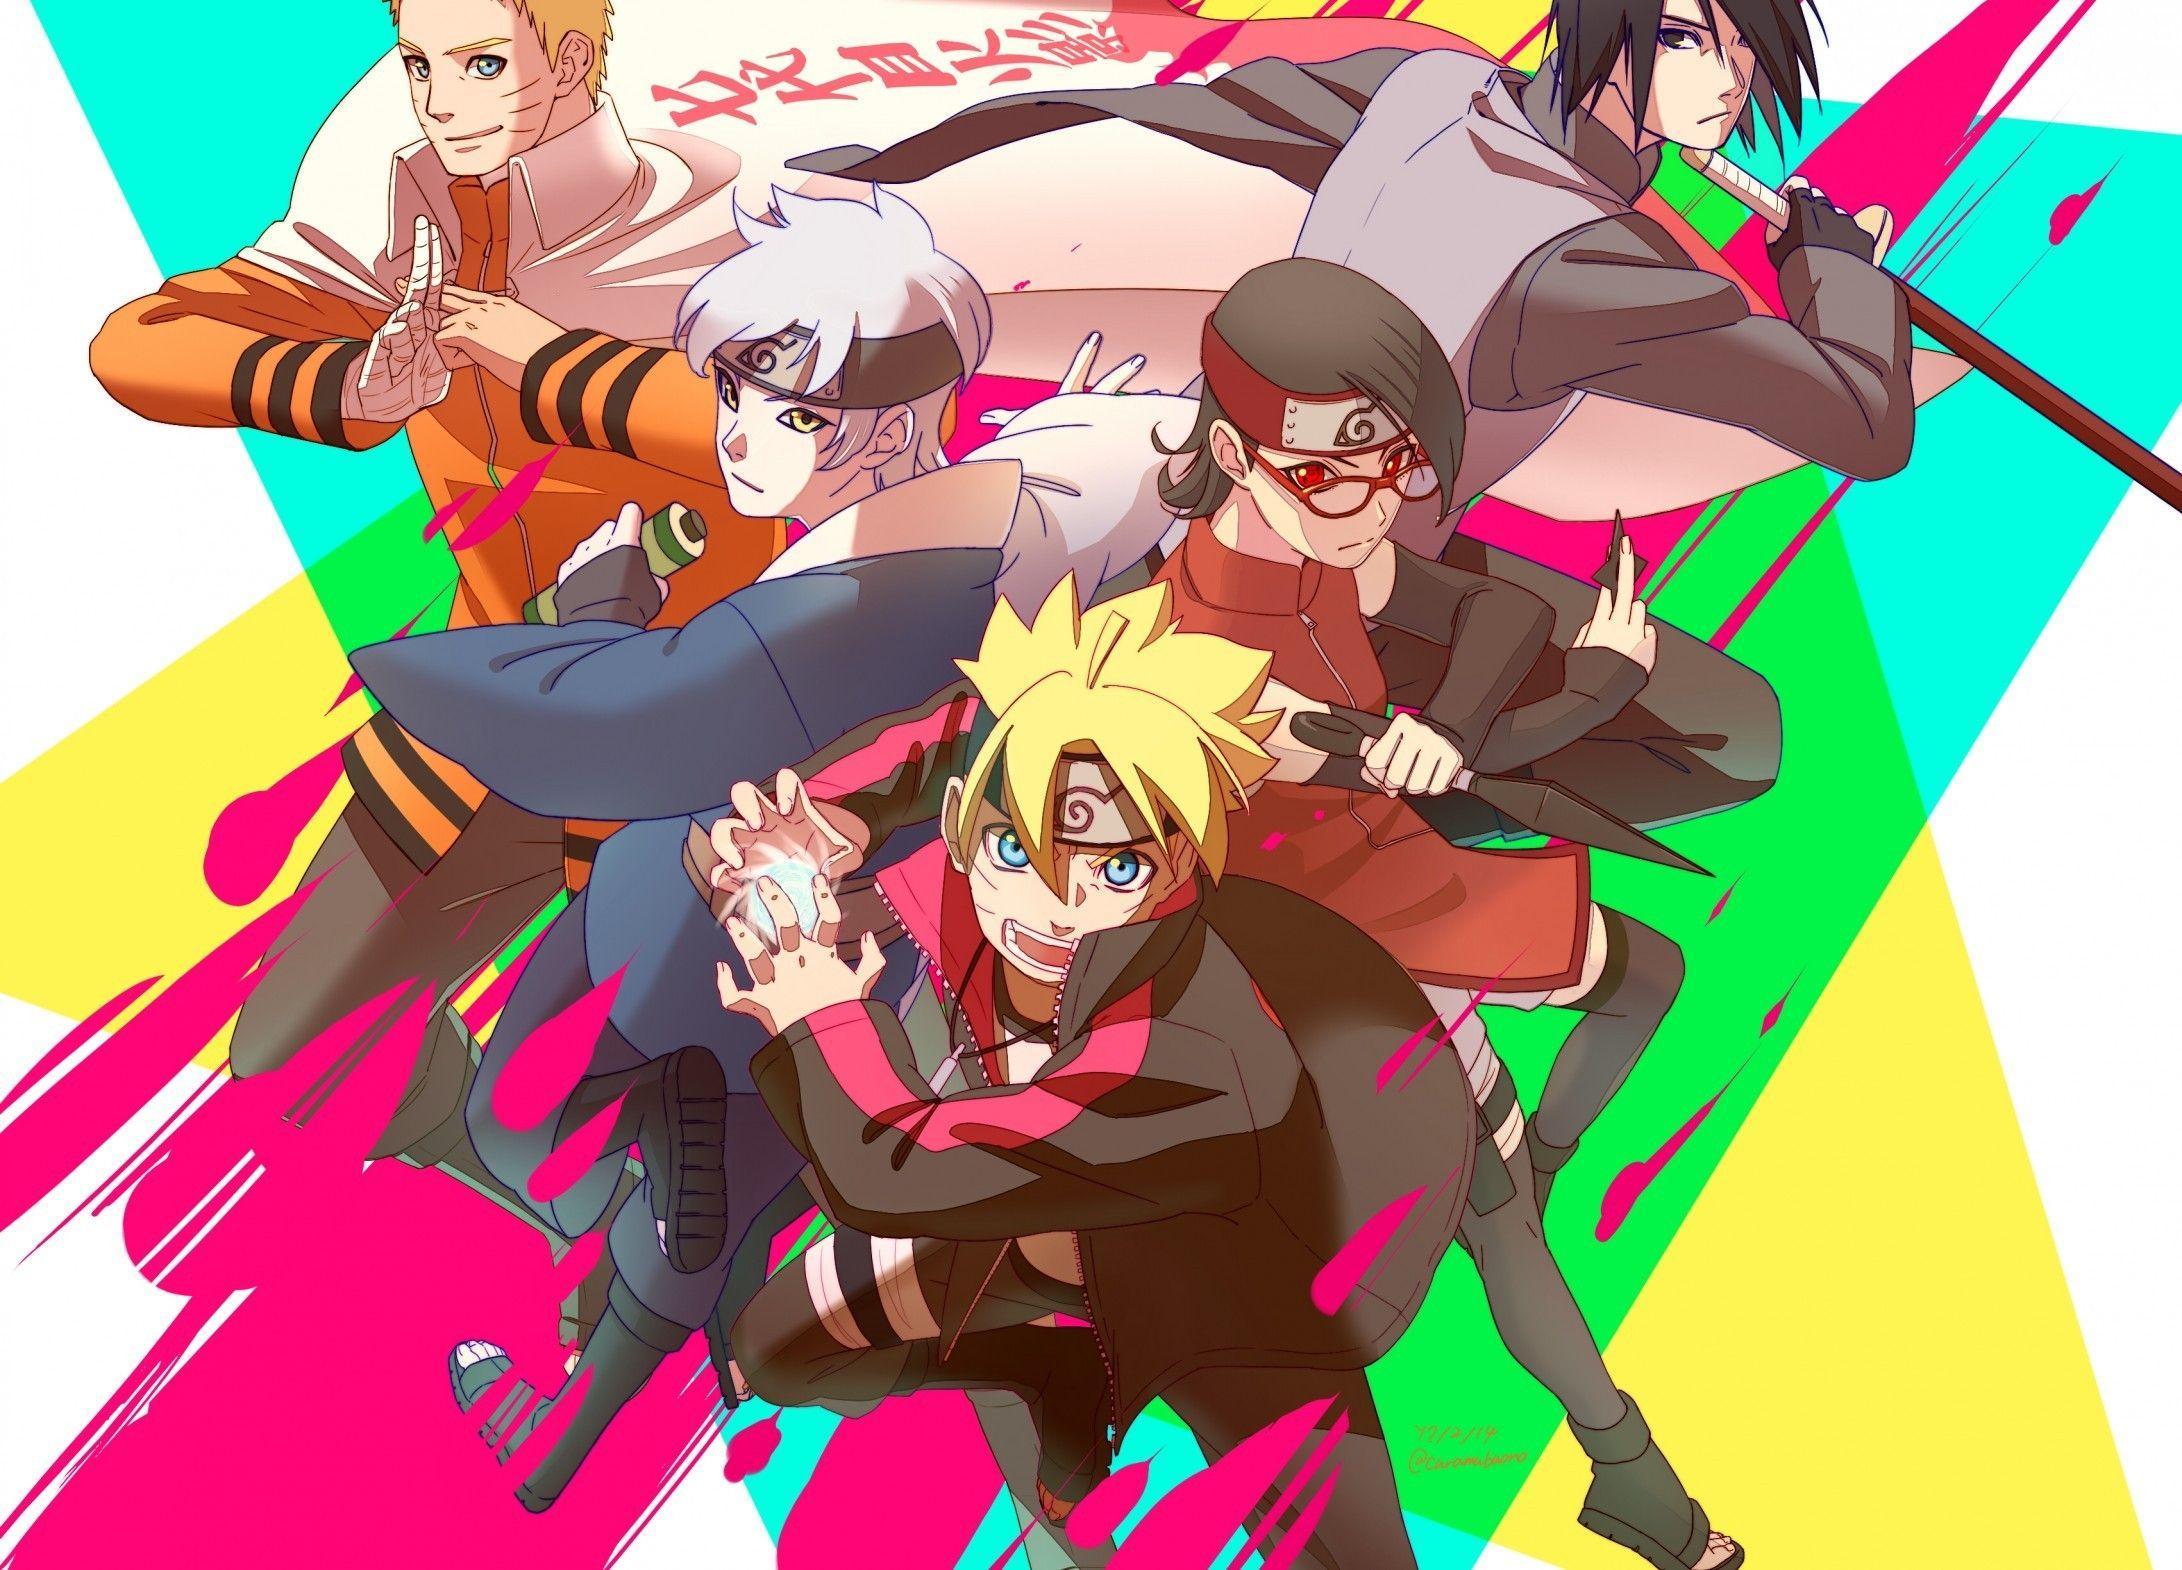 Sasuke Boruto Wallpapers Top Free Sasuke Boruto Backgrounds Wallpaperaccess